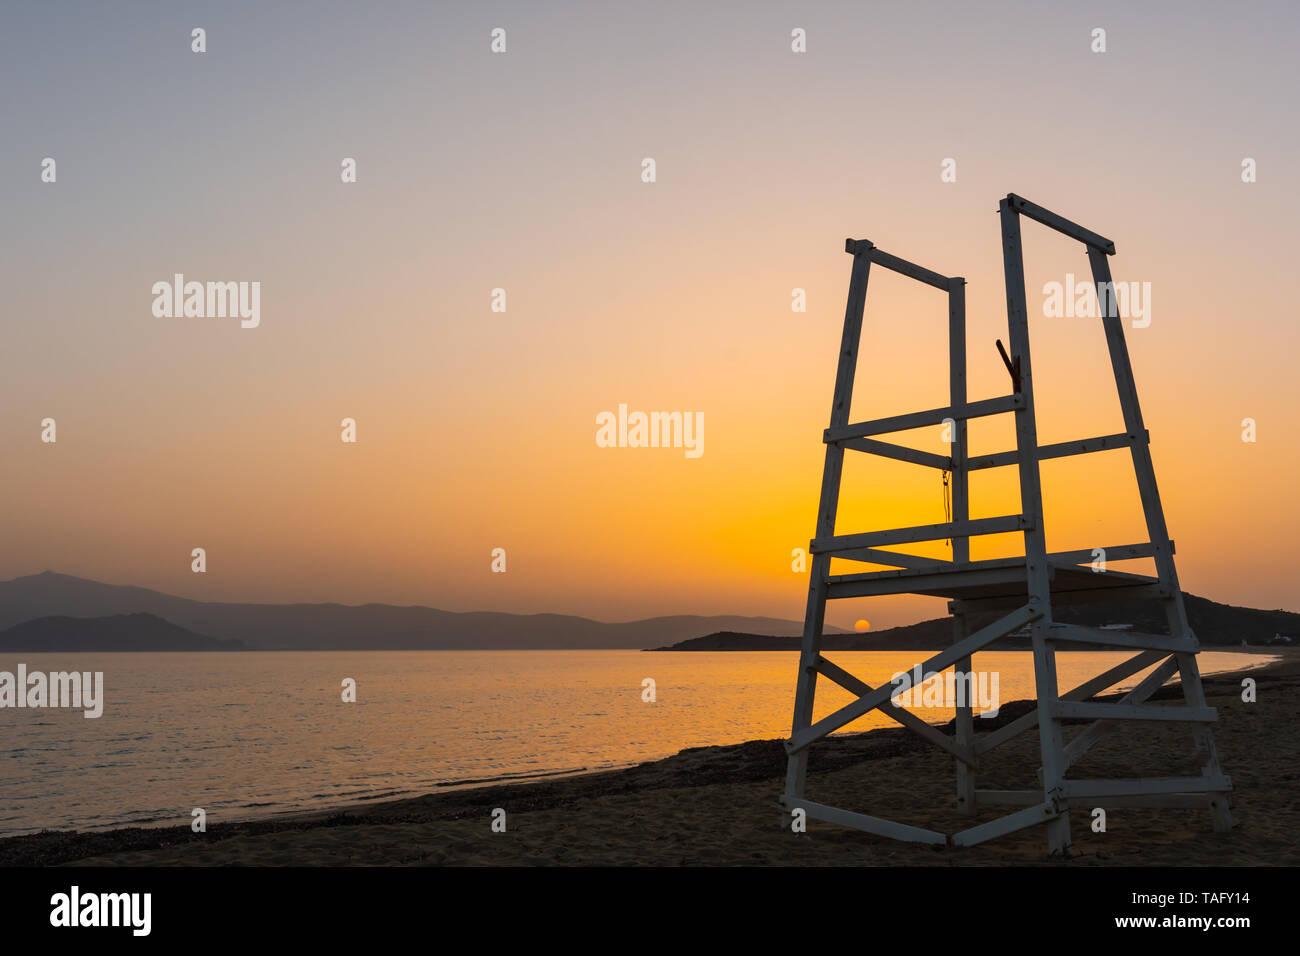 View of the sunset from Agios Prokopios beach, Naxos, Greece Stock Photo